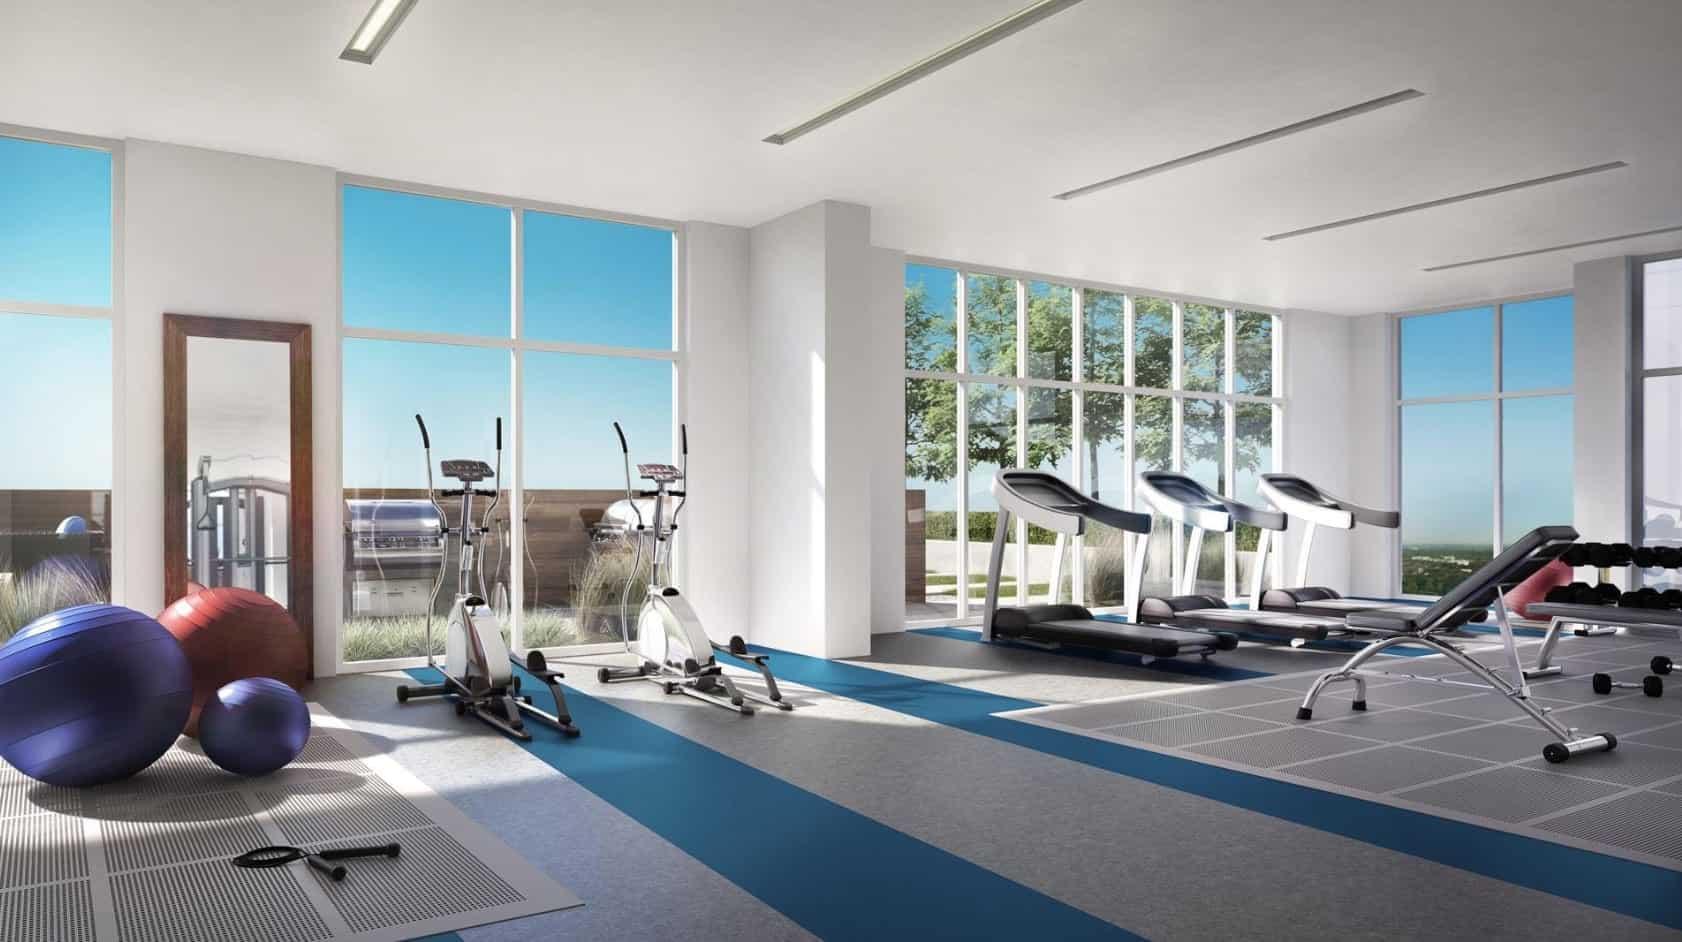 Azure Condos Gym Amenities True Condos